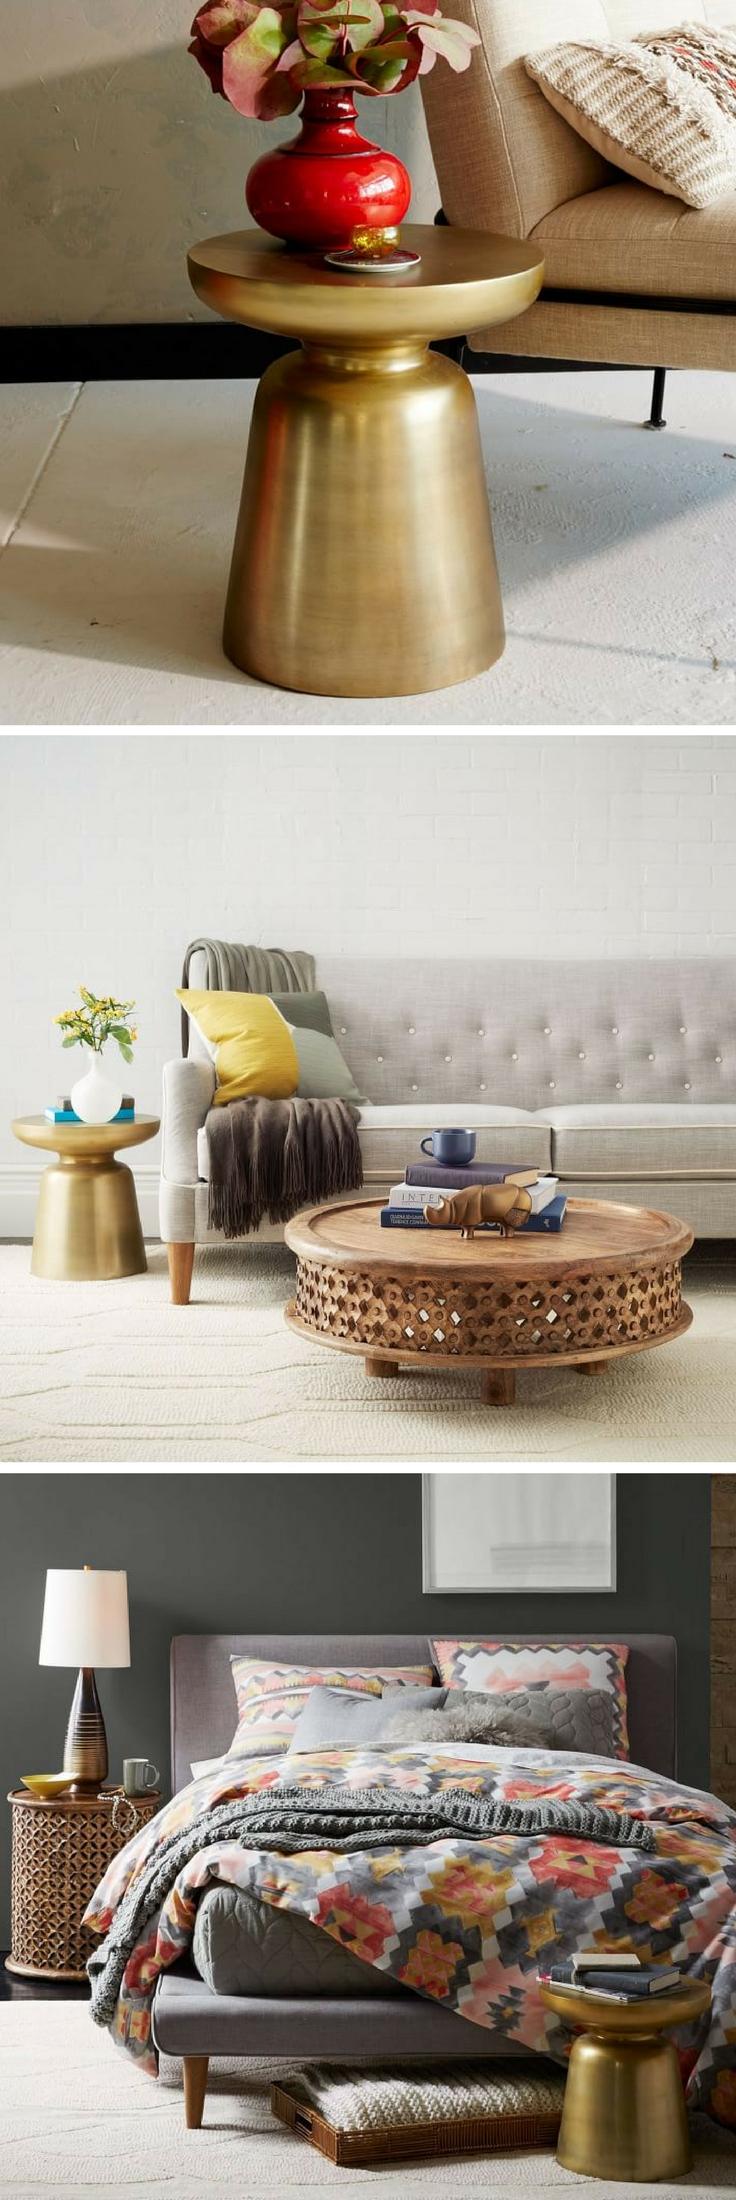 Martini Side Table | End Table | Side Table | Metallic | Living Room Decor |